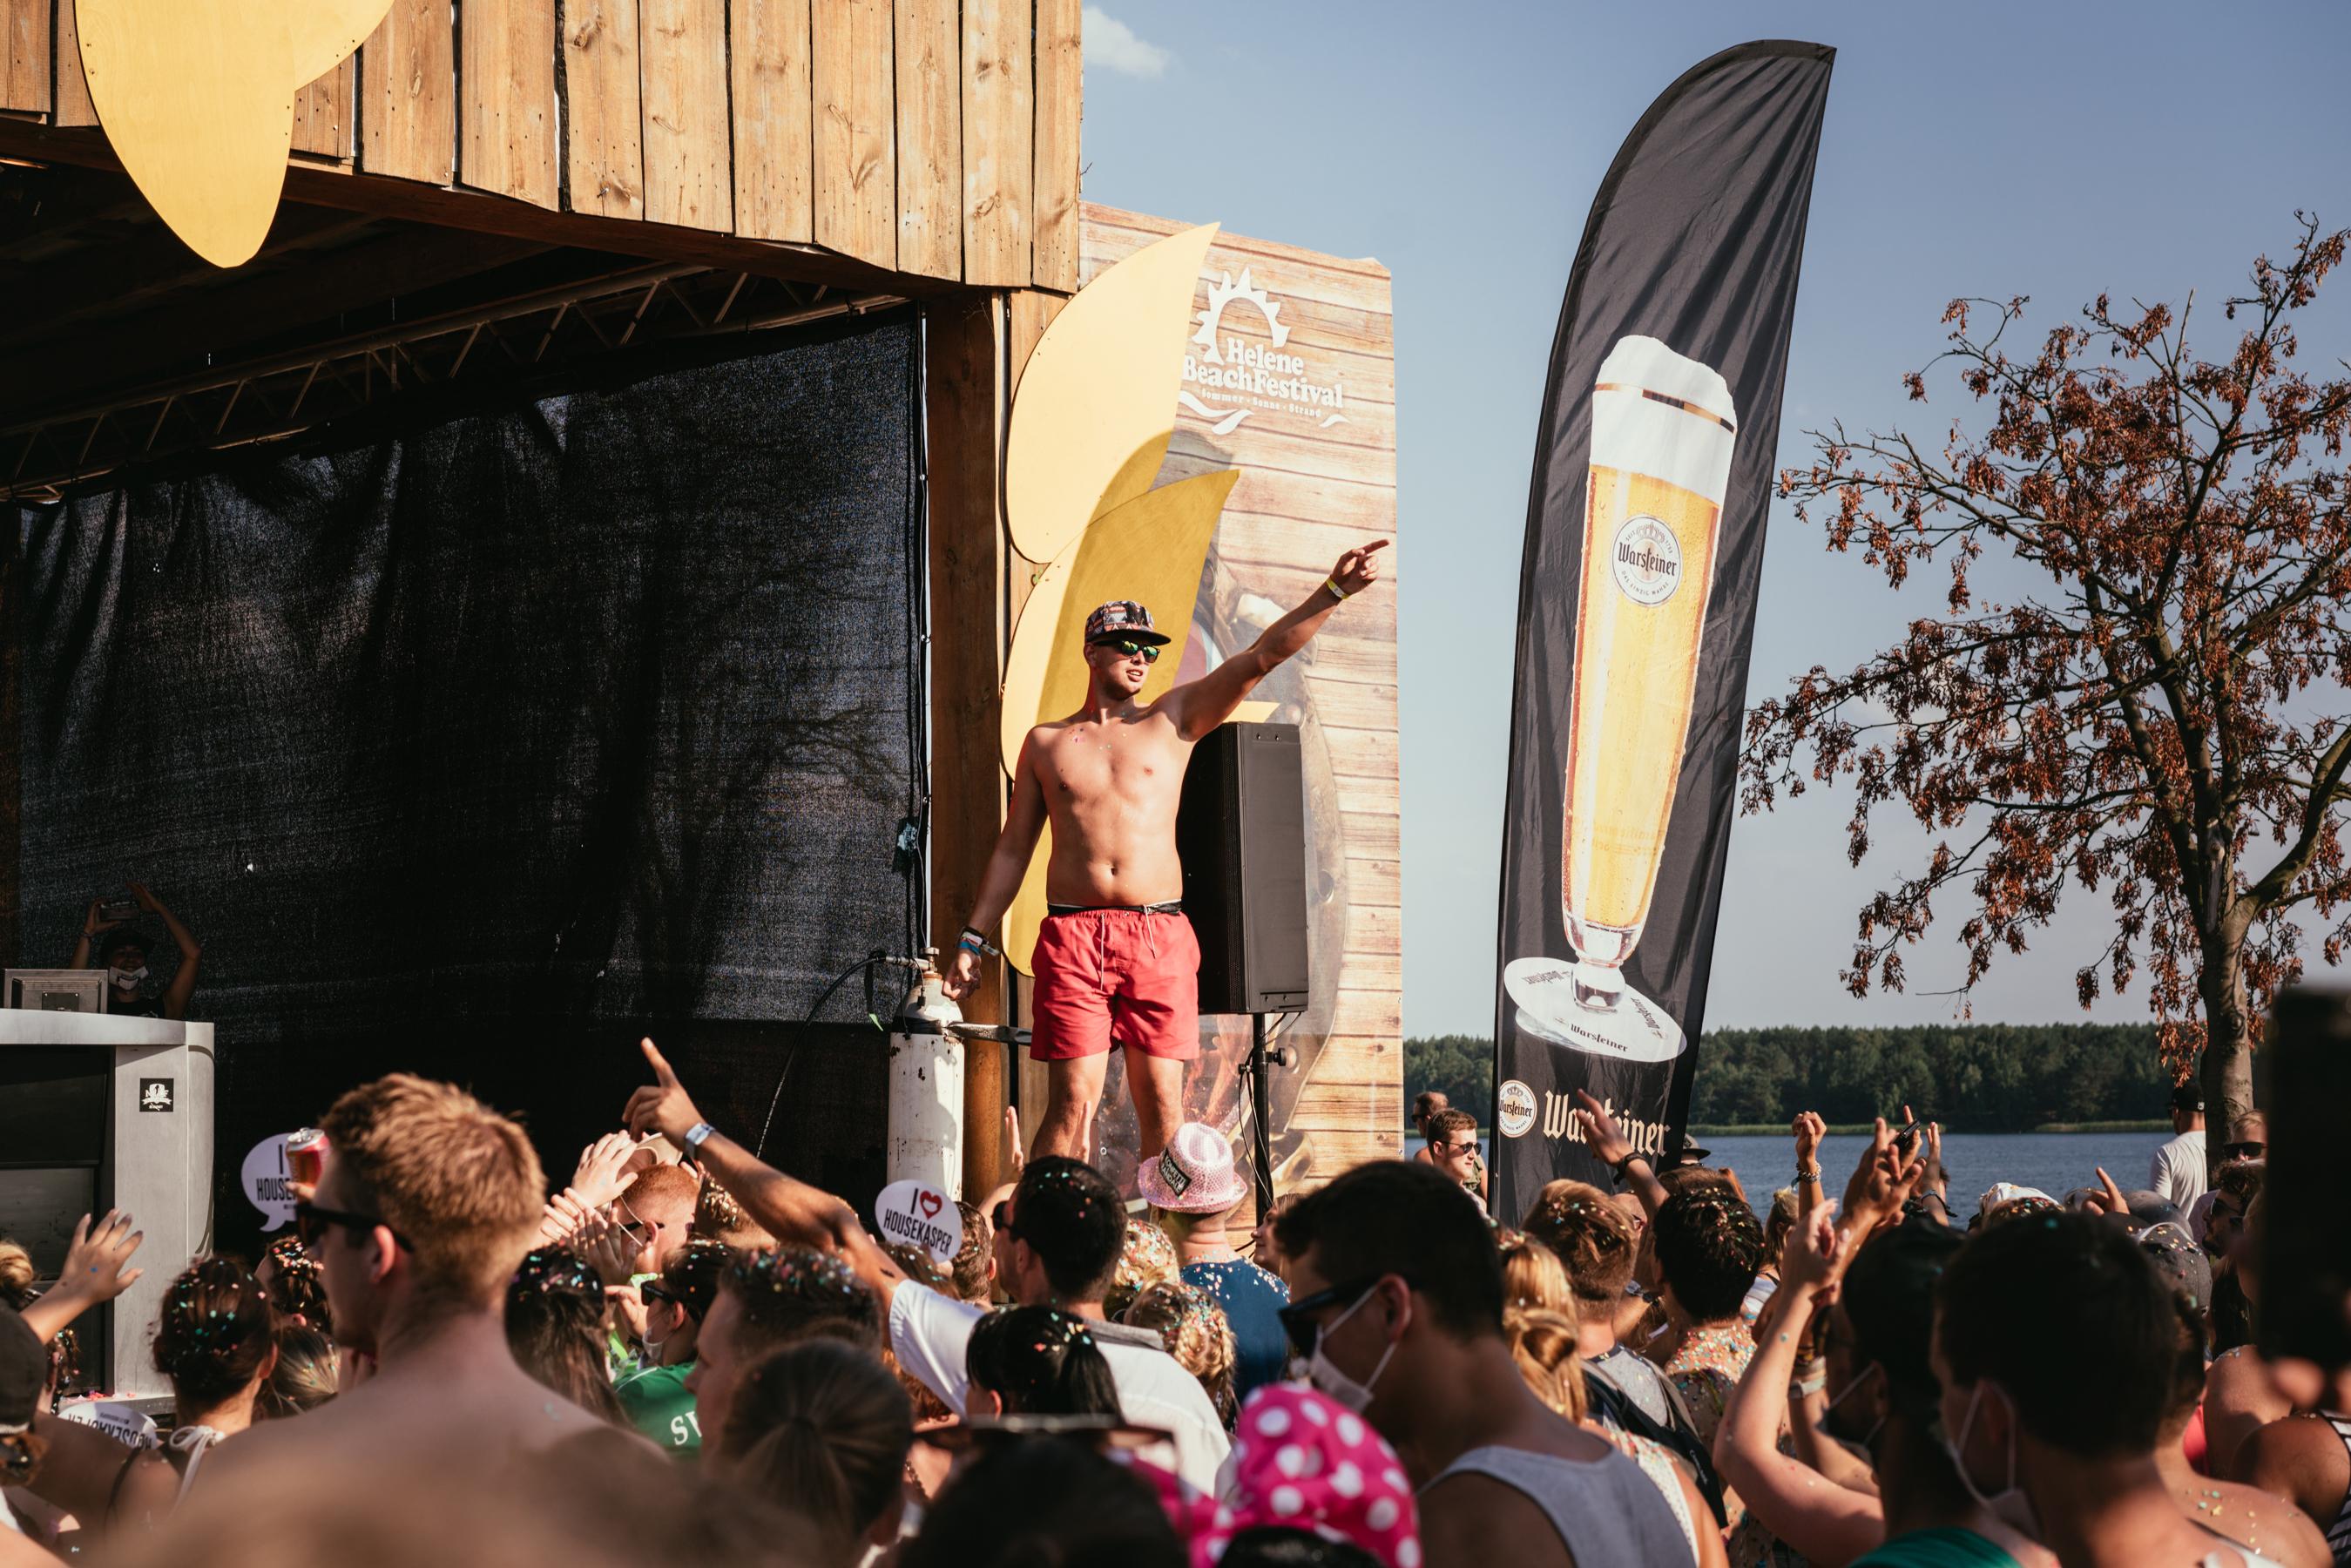 28-07-2018 Helene Beach Festival_Impressions-16 Kopie